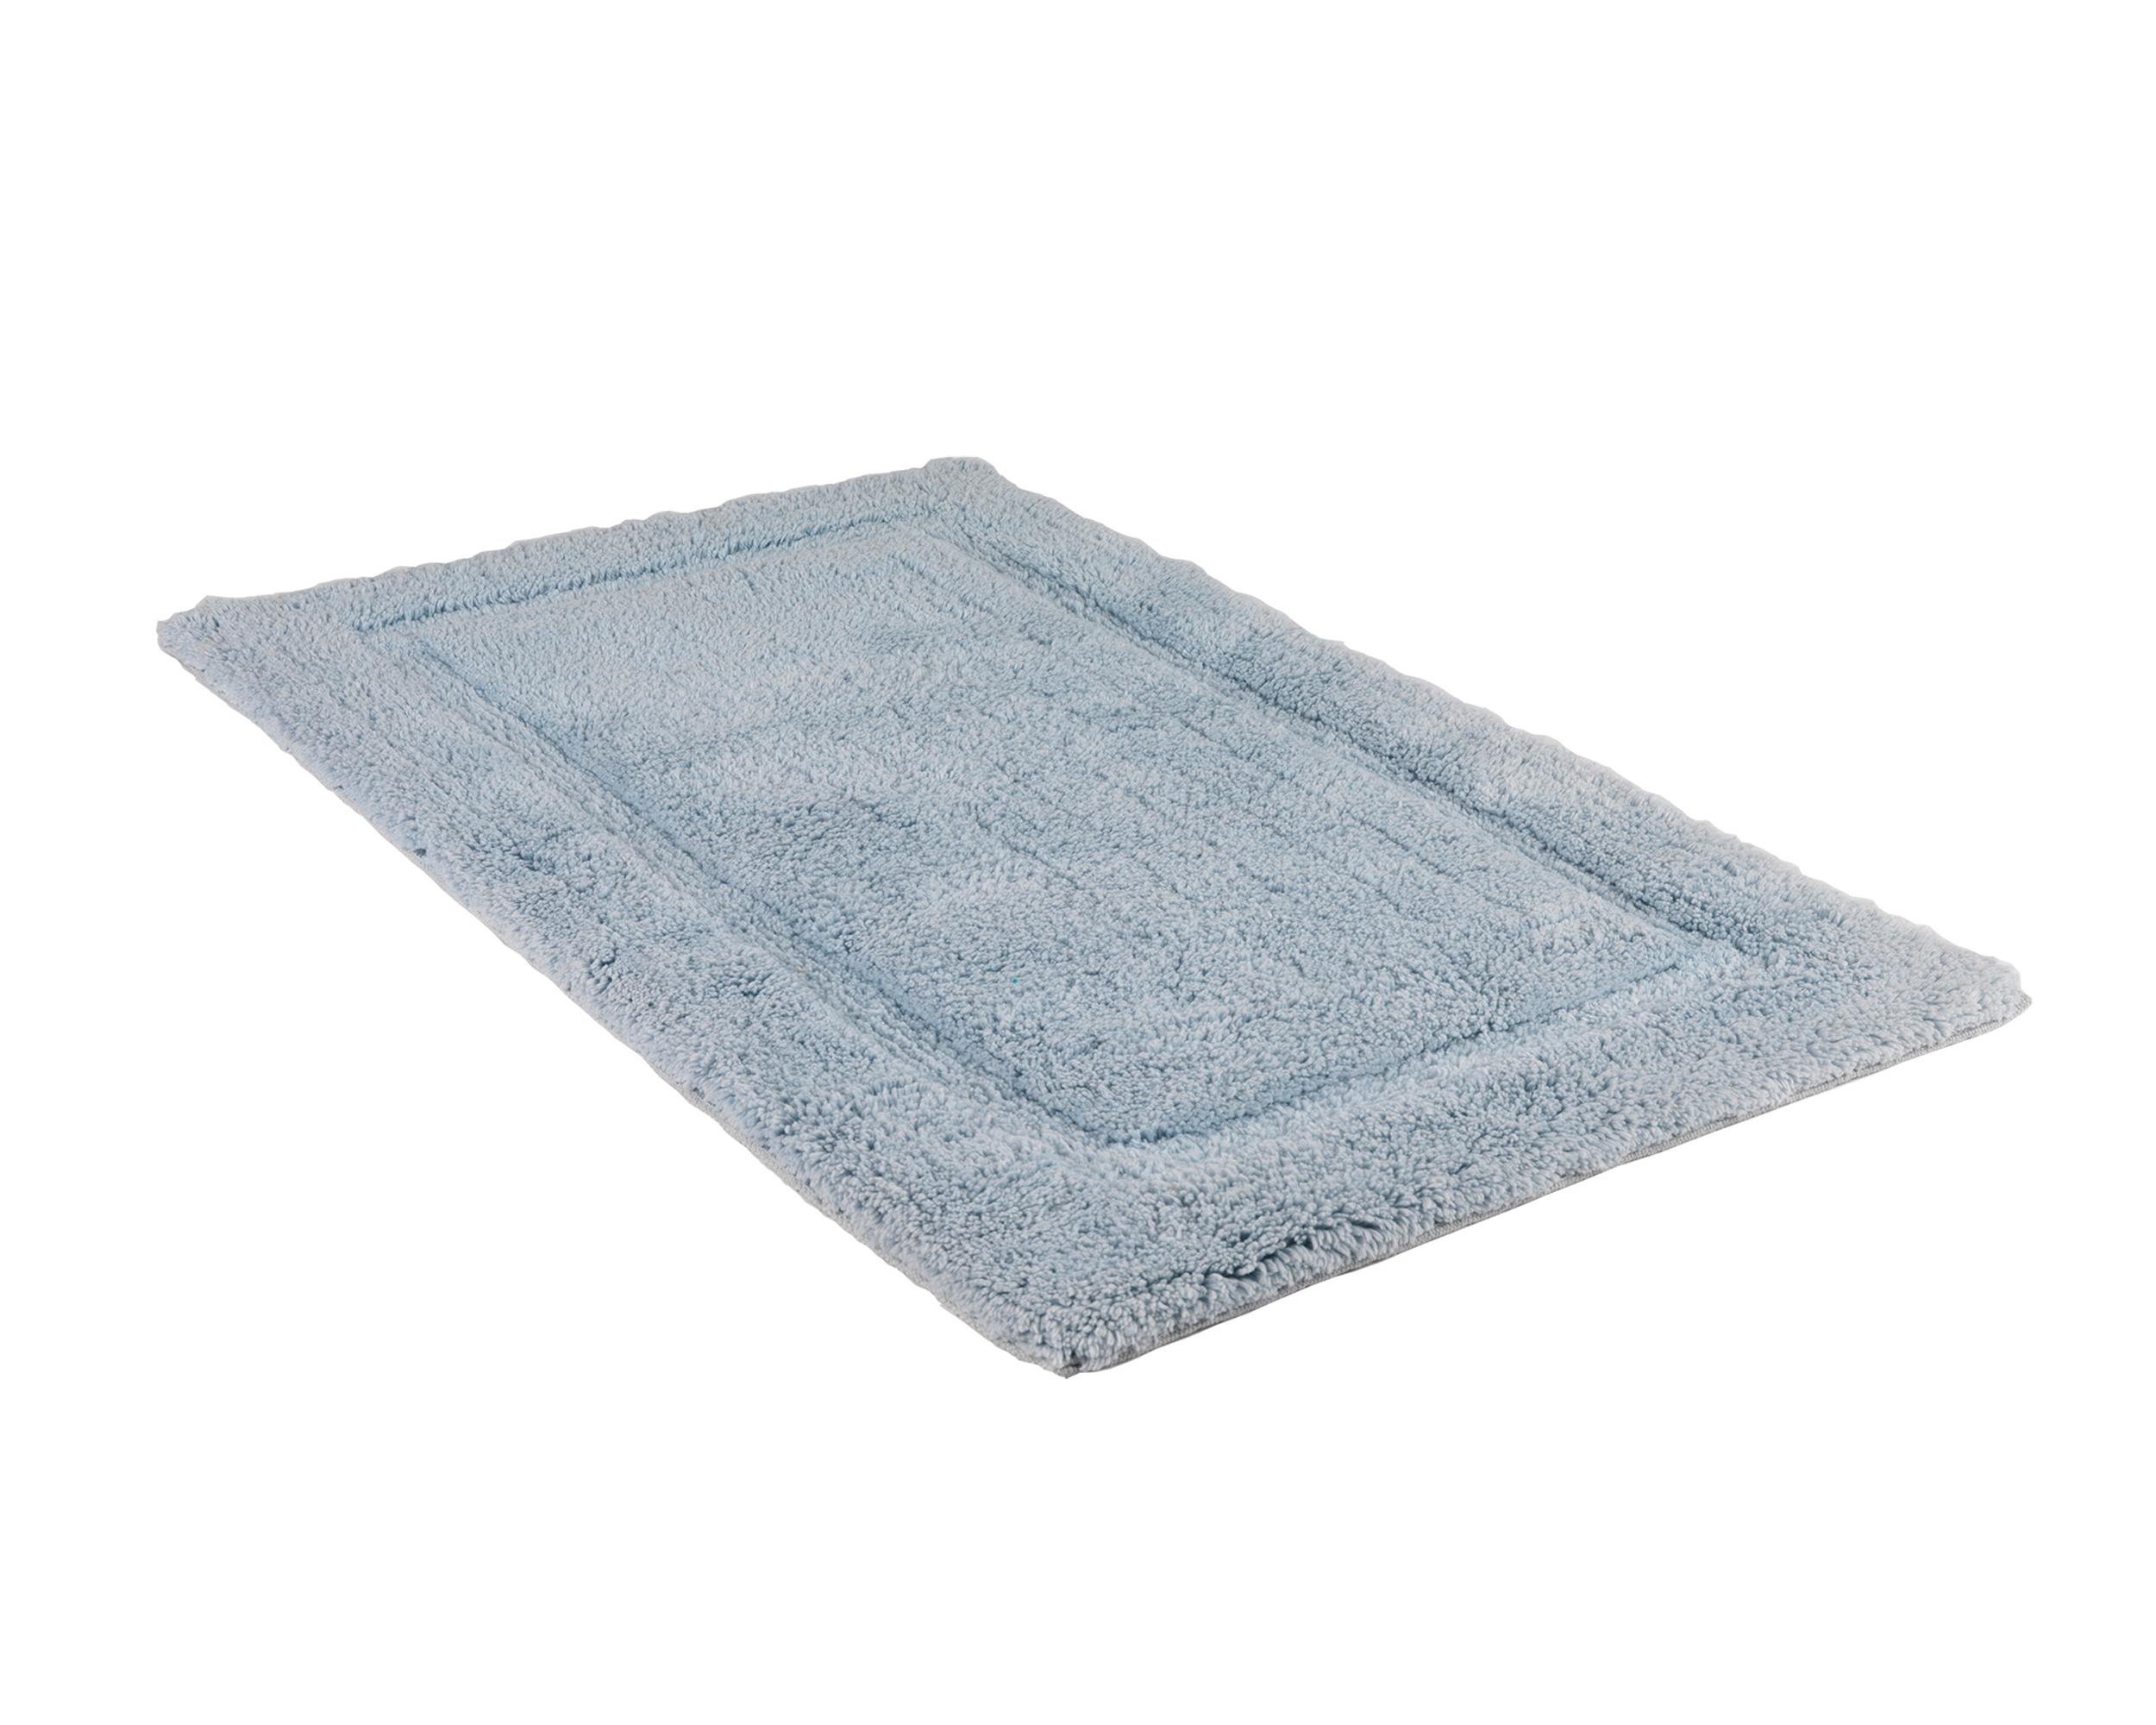 Beldray 2 Piece Latex Backed Embossed Blue Bathroom Mat